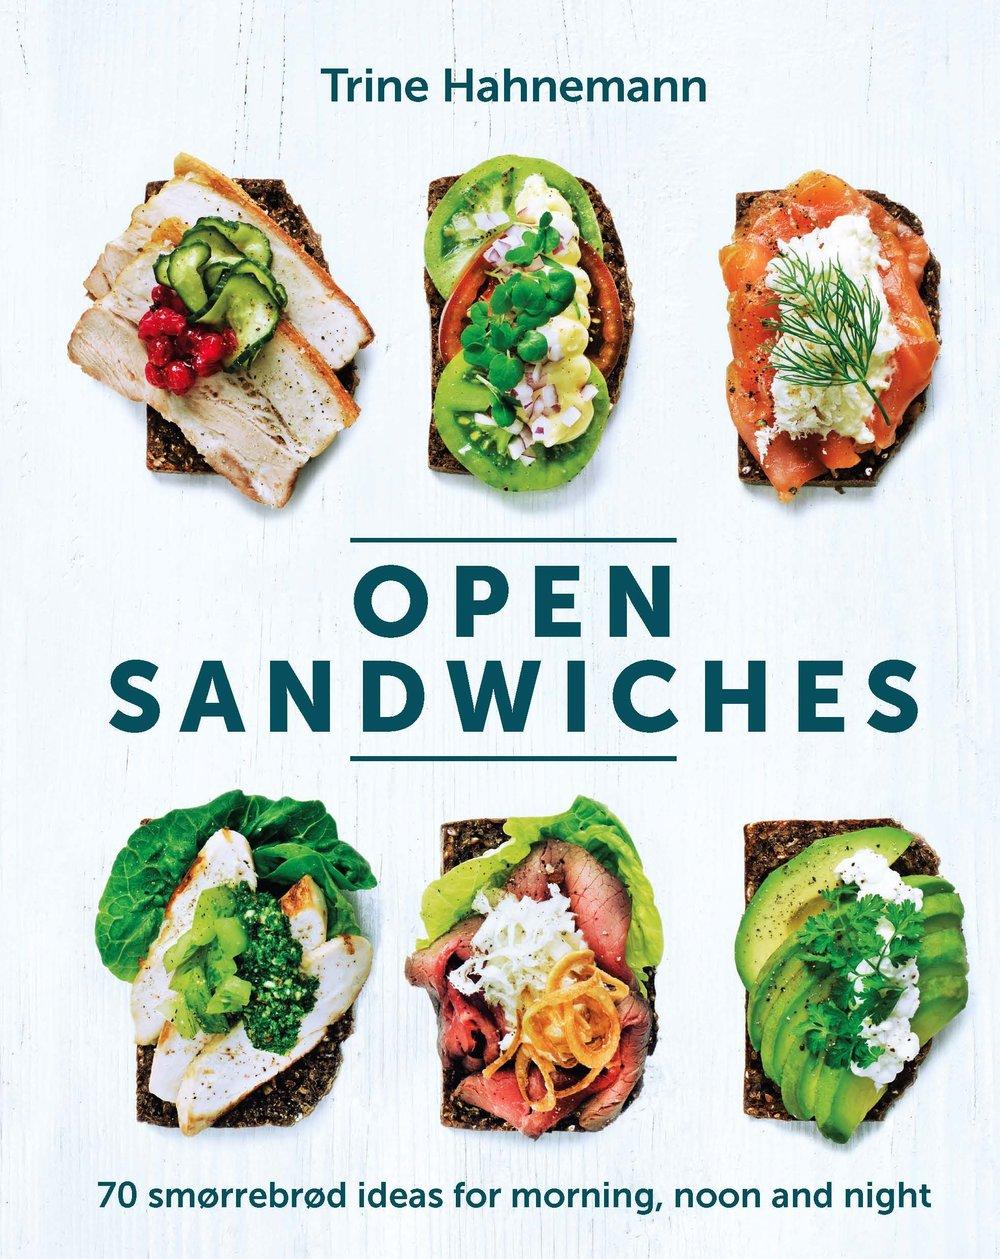 opensandwiches.jpg